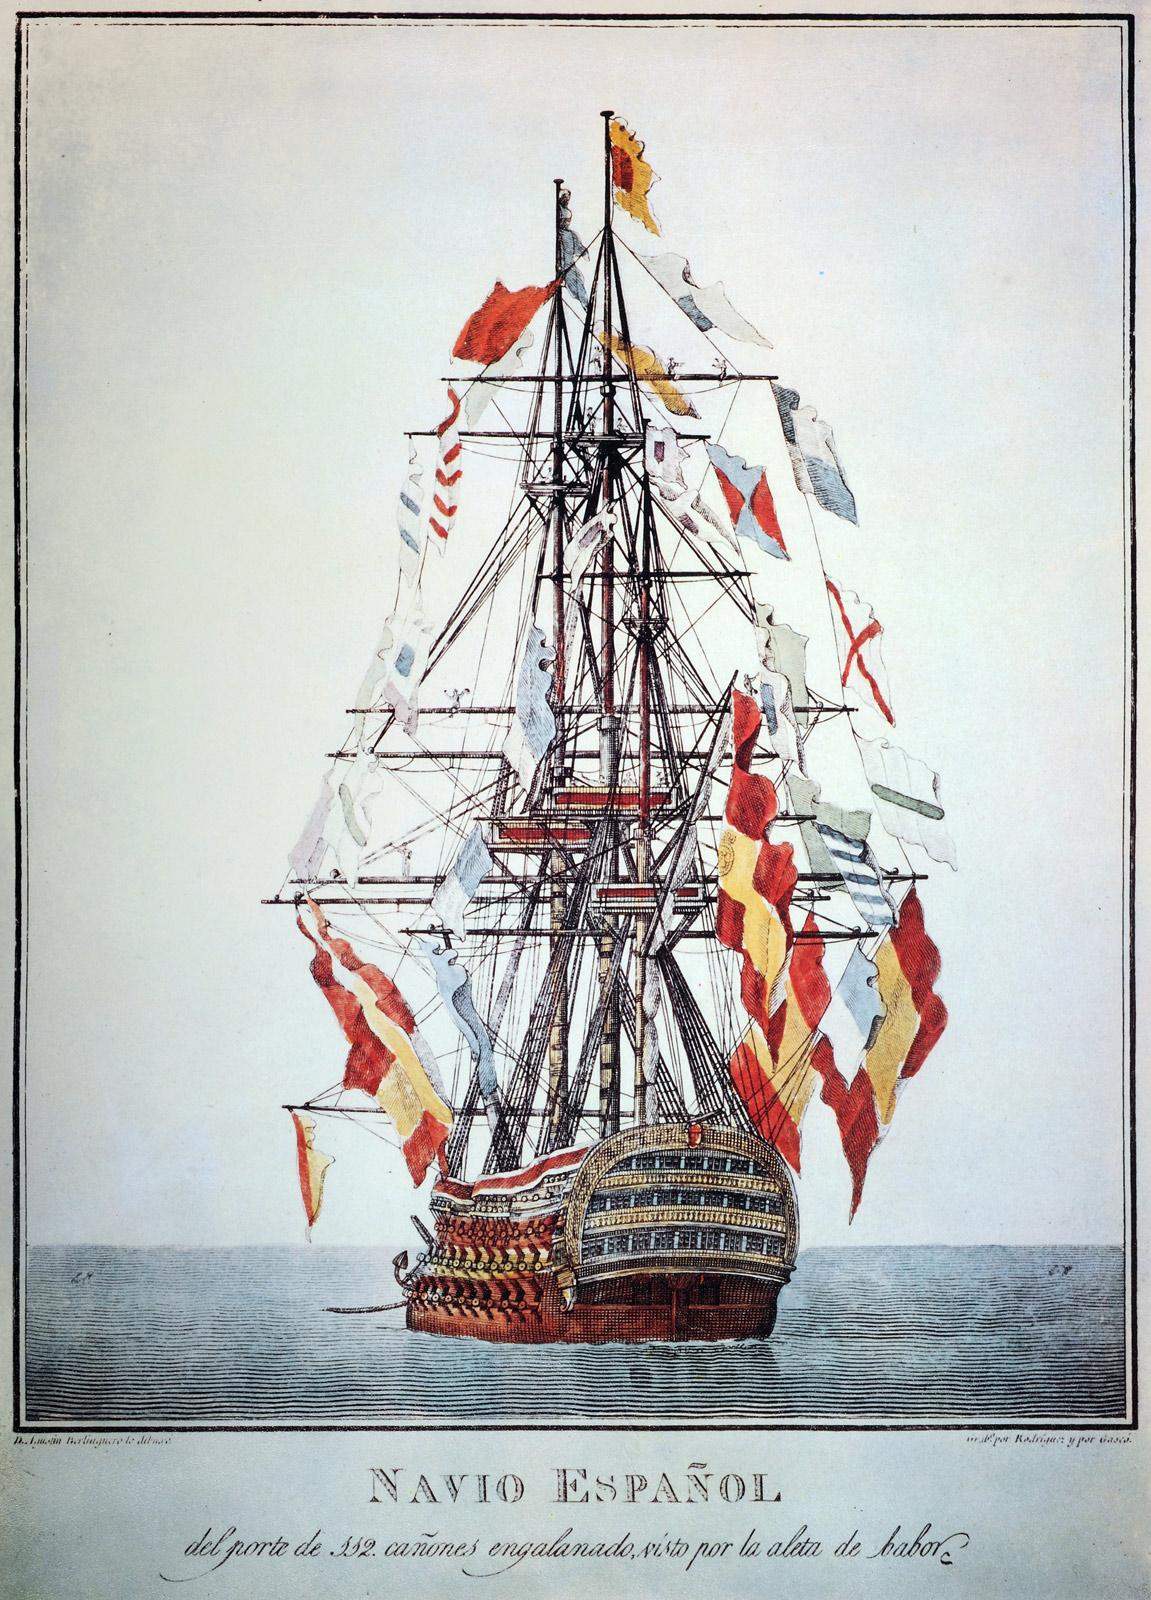 Navio español